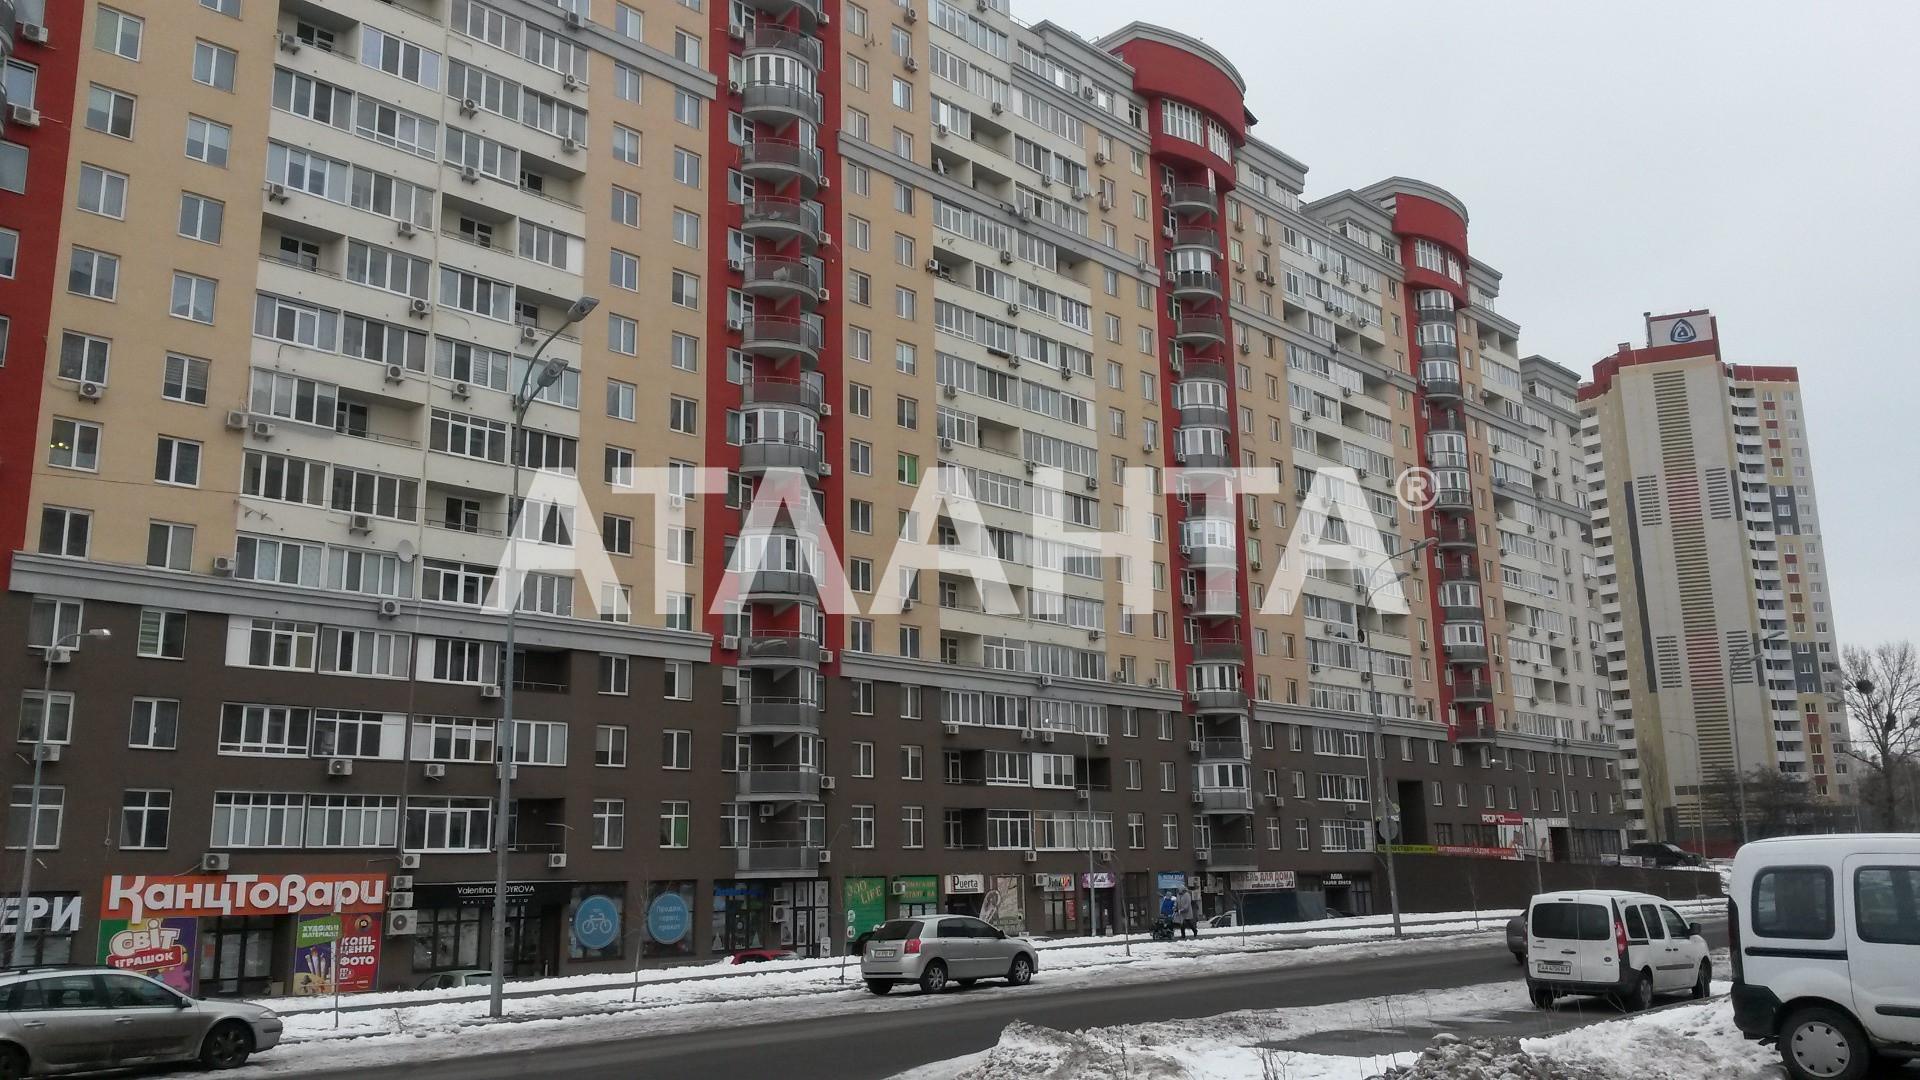 Продается 1-комнатная Квартира на ул. Ломоносова — 66 900 у.е. (фото №17)